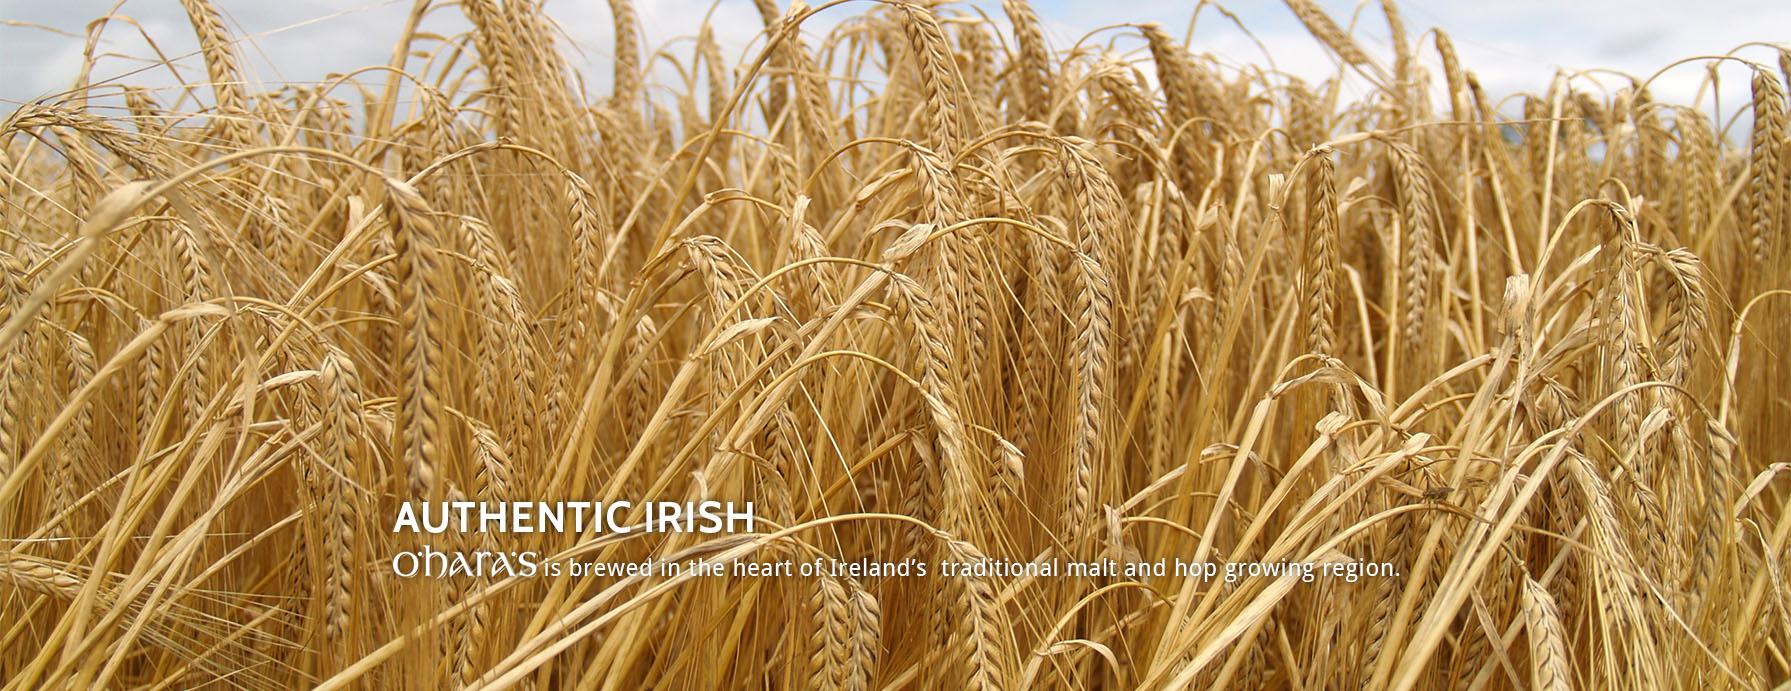 Home-Page-Authentic-Irish-1